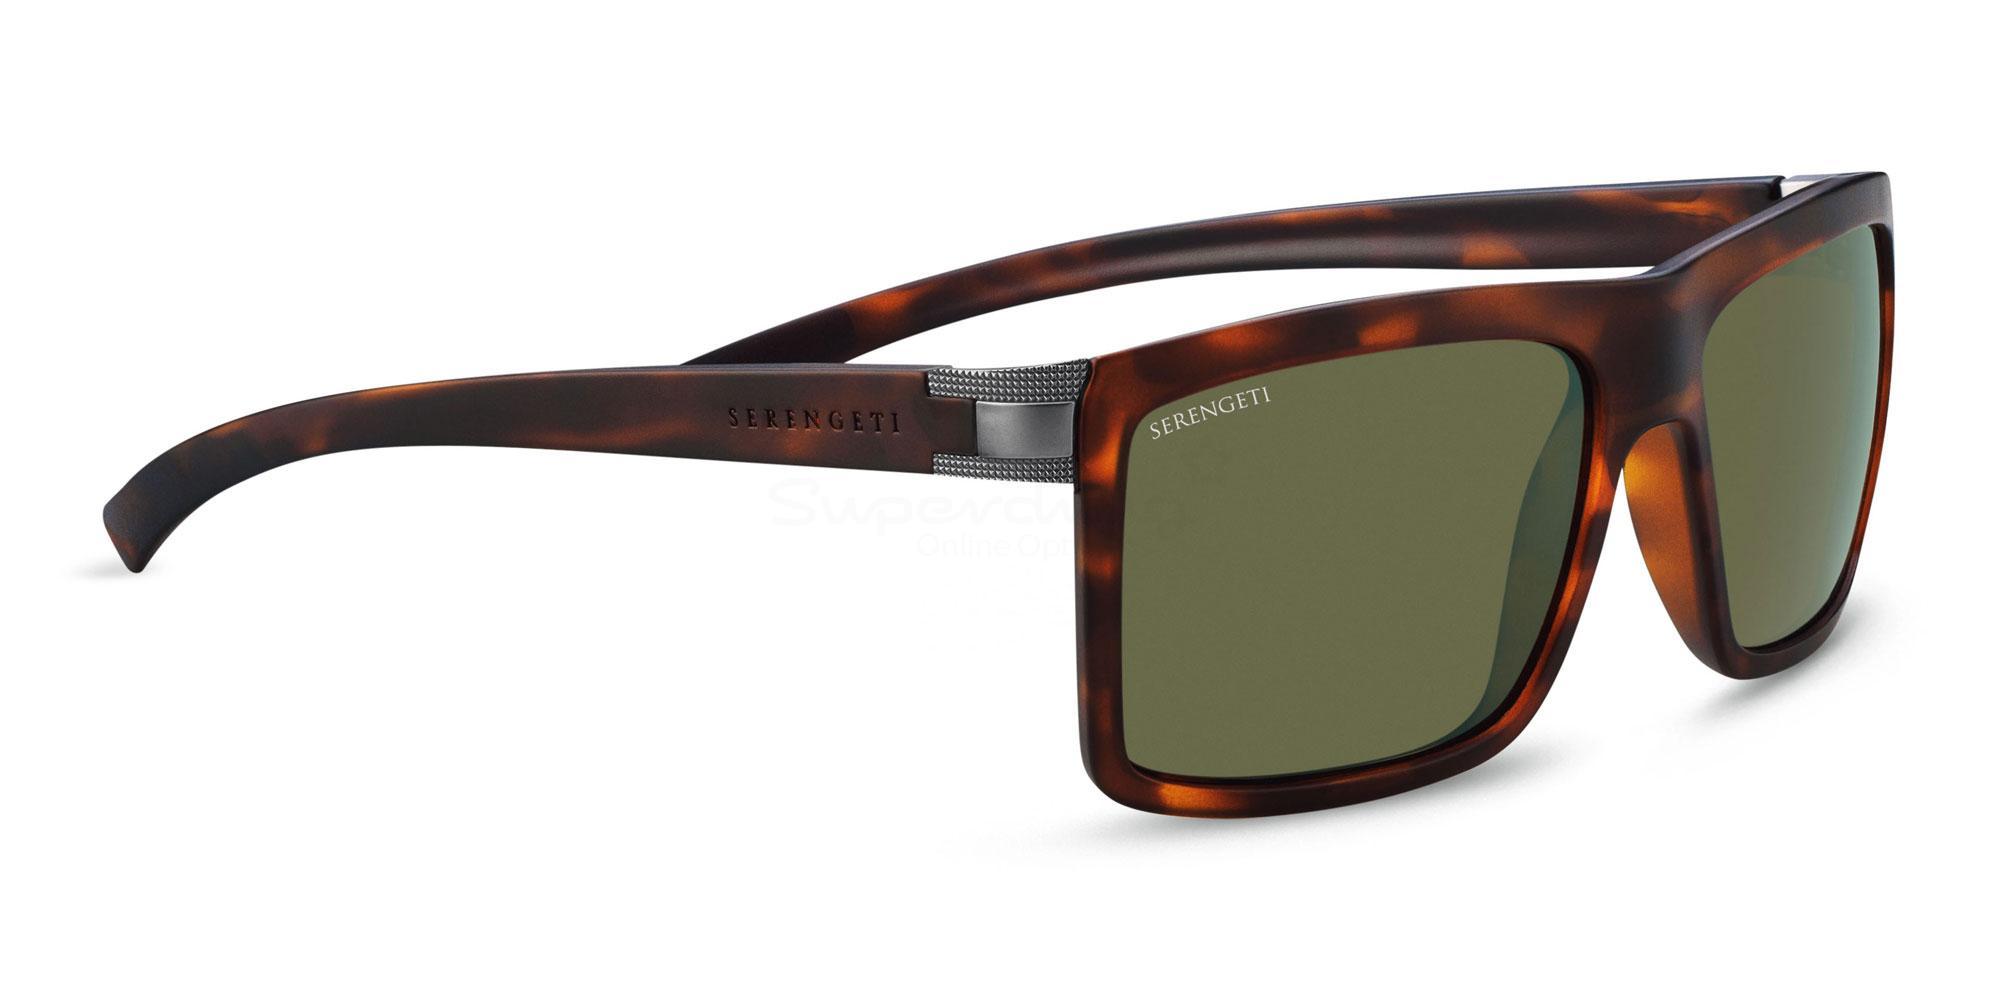 8579 Serengeti Signature BRERA LARGE Sunglasses, Serengeti